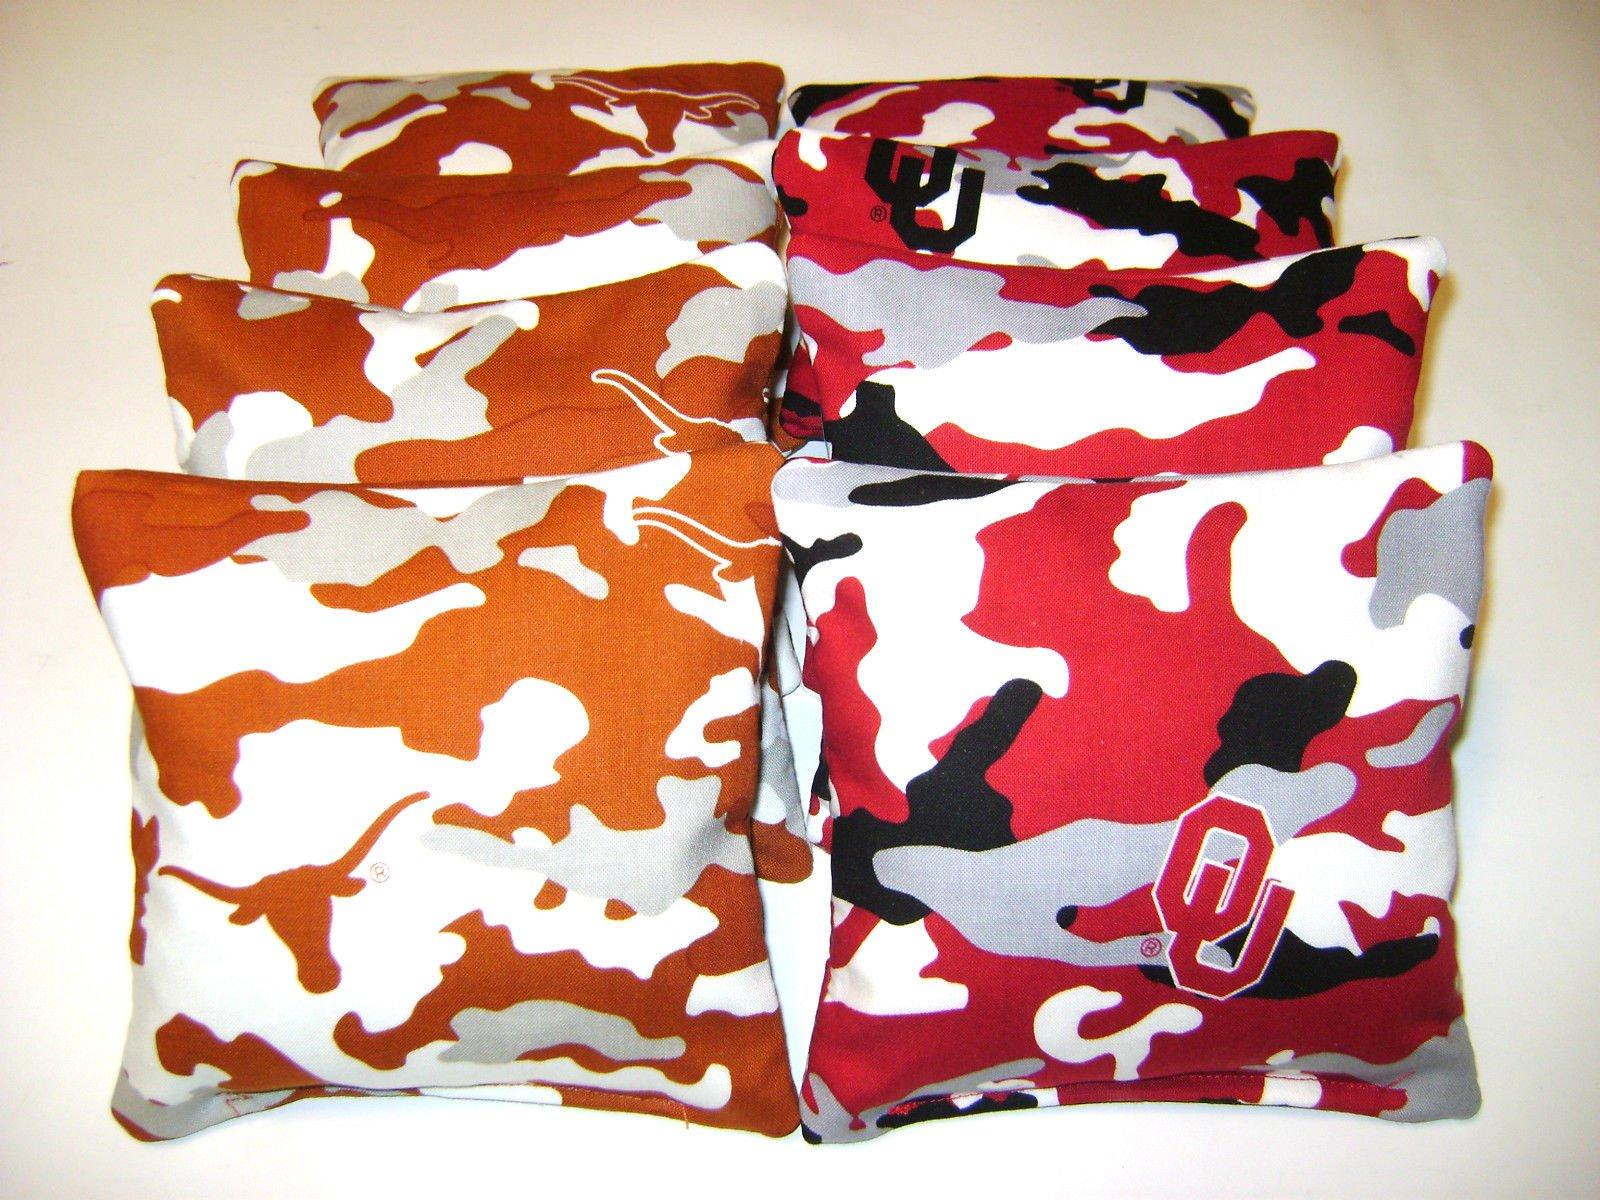 Texas Longhorns Vs Oklahoma Sooners Red River Cornhole Bean Bags 8 Camo Toss